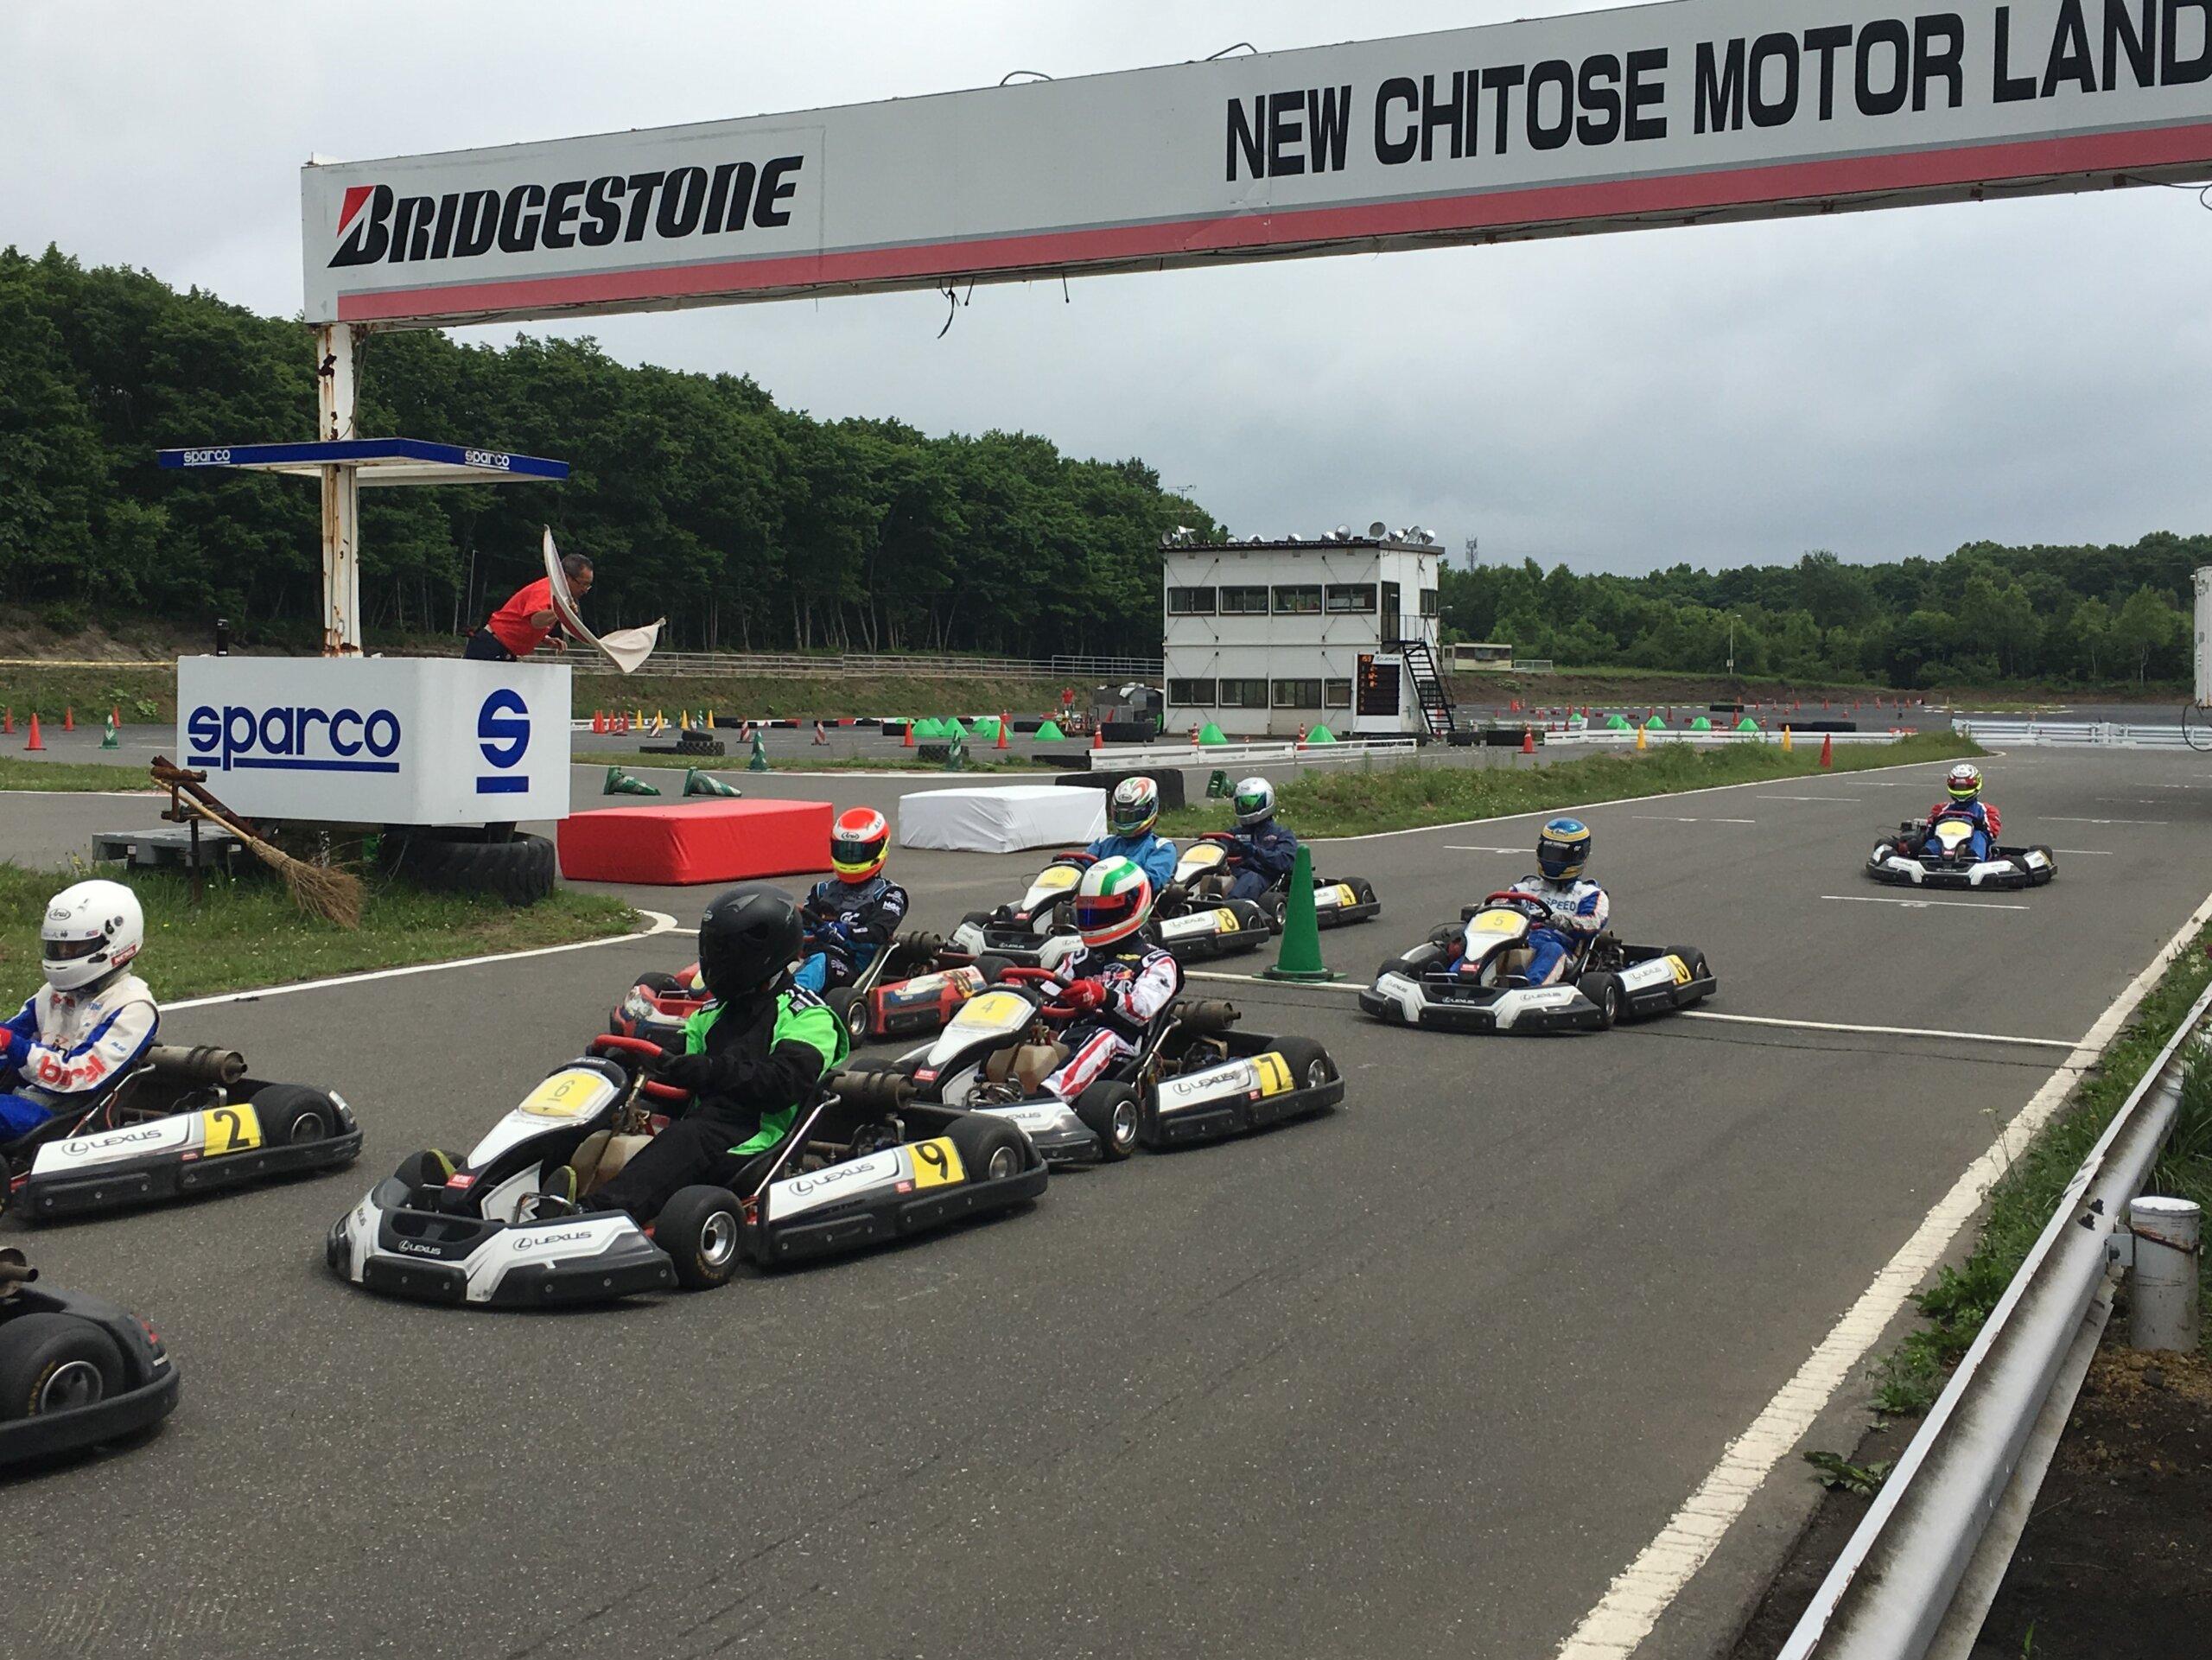 Enjoy the Exhilarating Feeling of F1 Racing in a Rental Kart